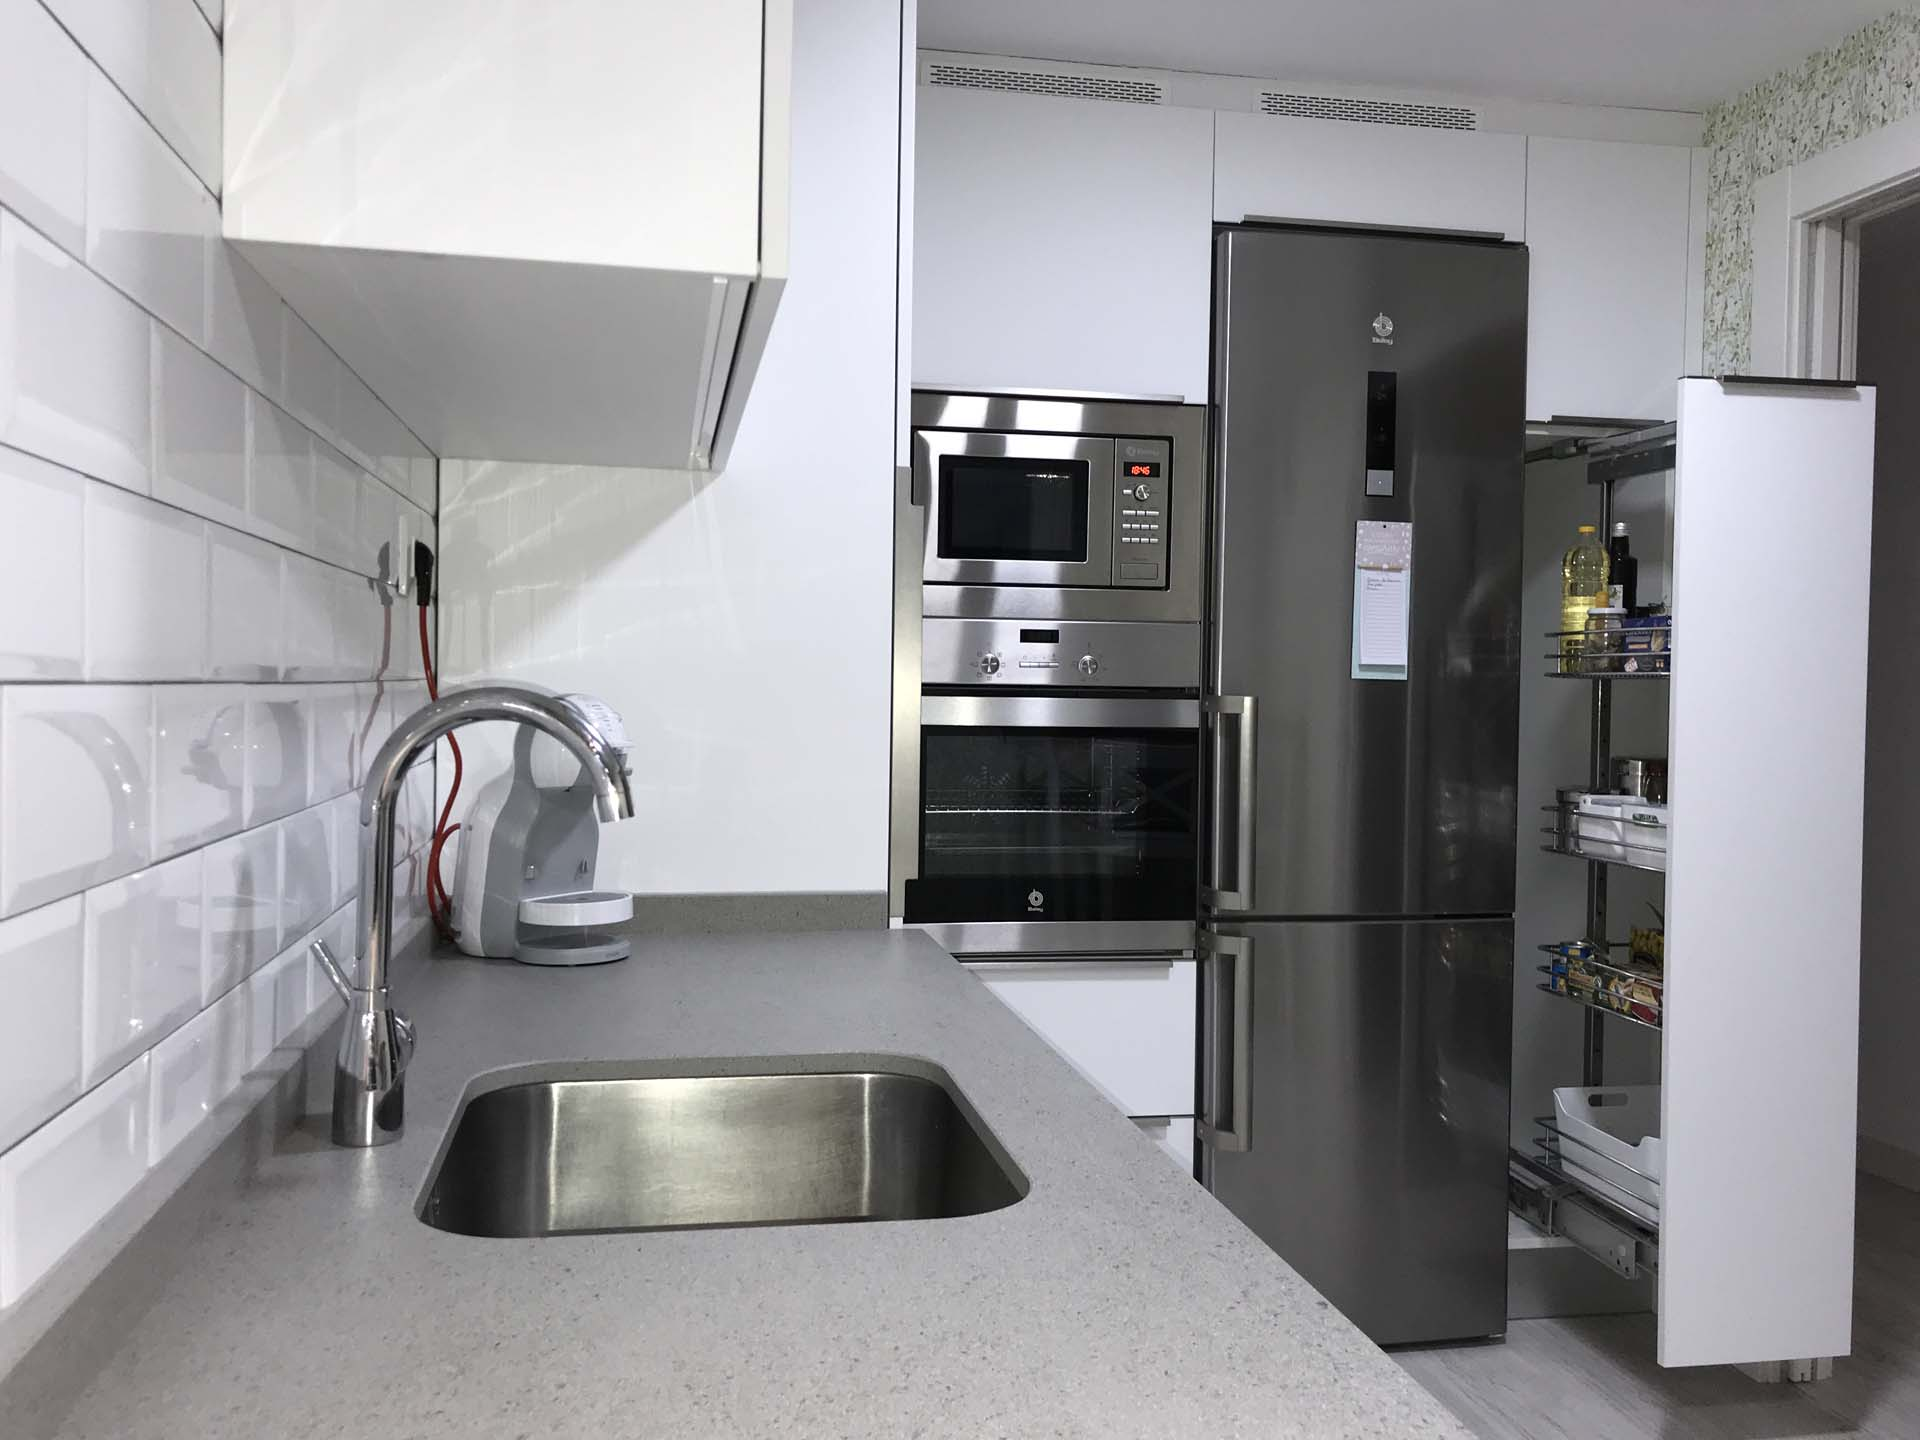 extraible despensero mueble cocina